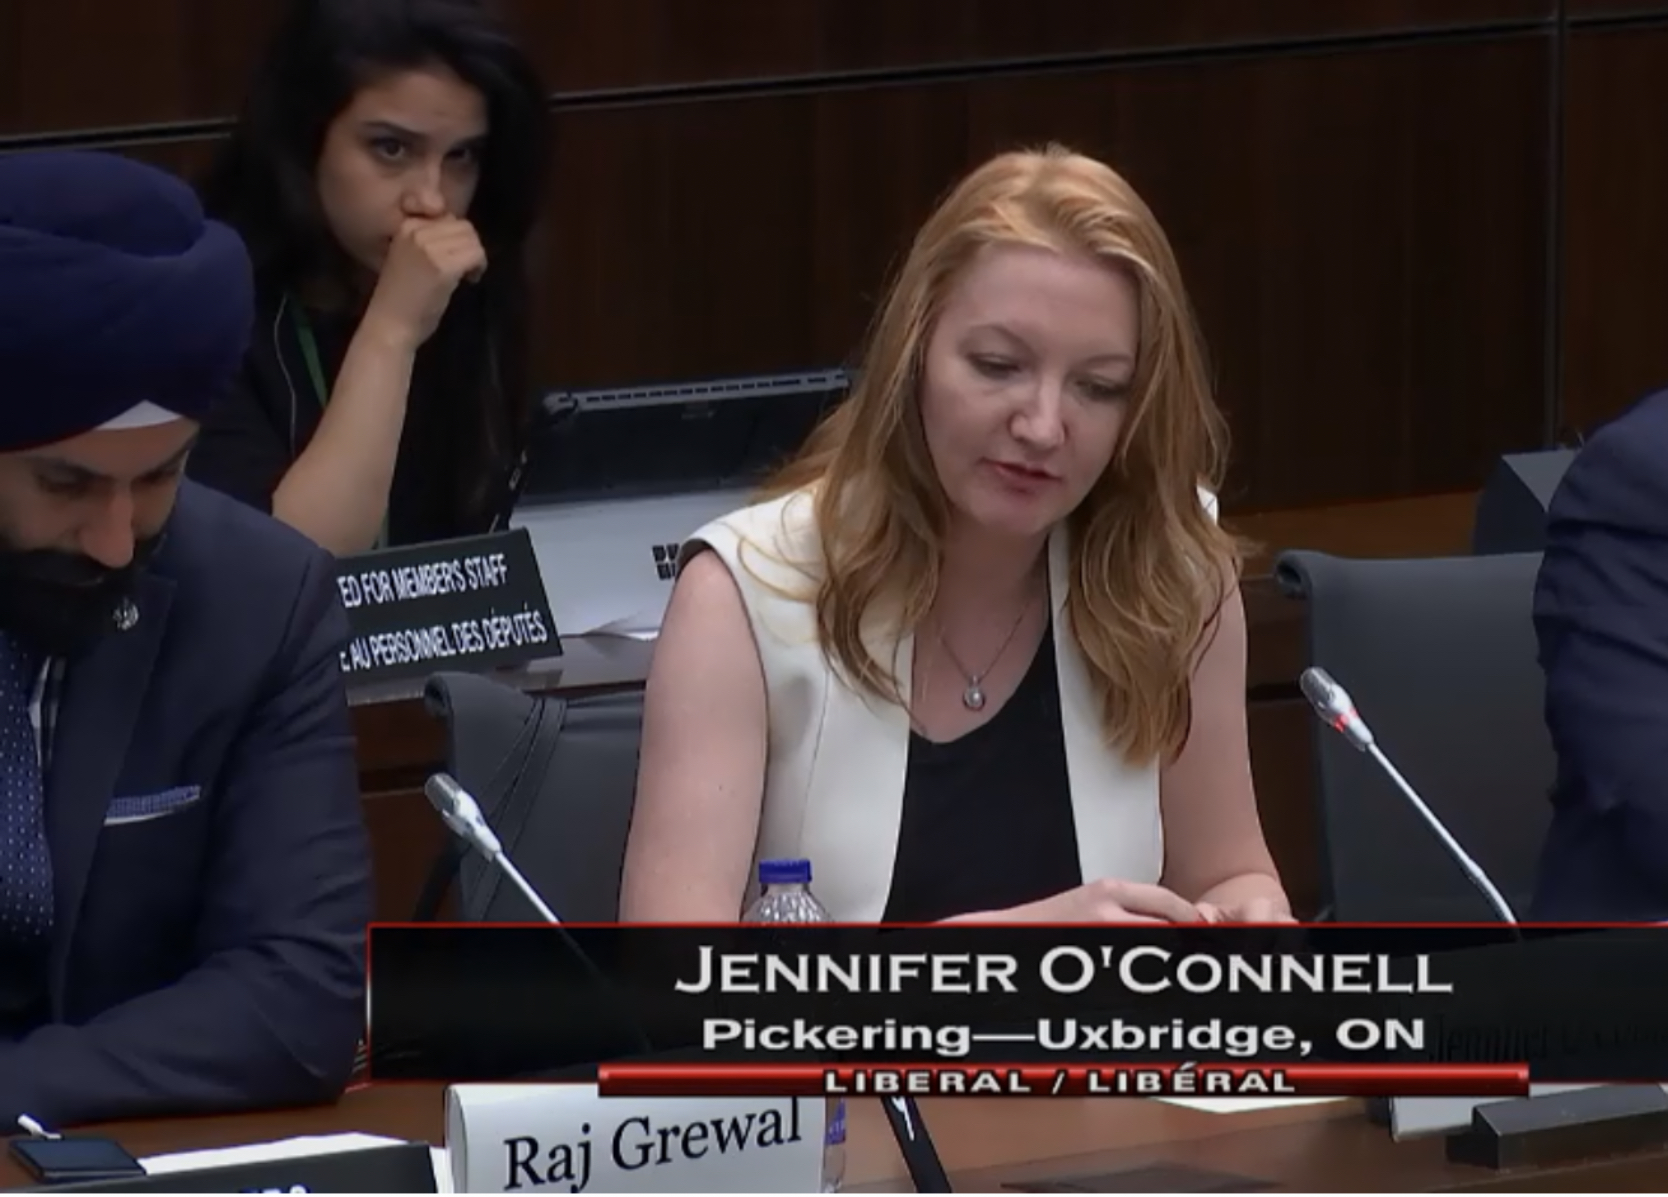 Understanding the Political Financing of Jennifer O'Connell, MP Pickering Uxbridge